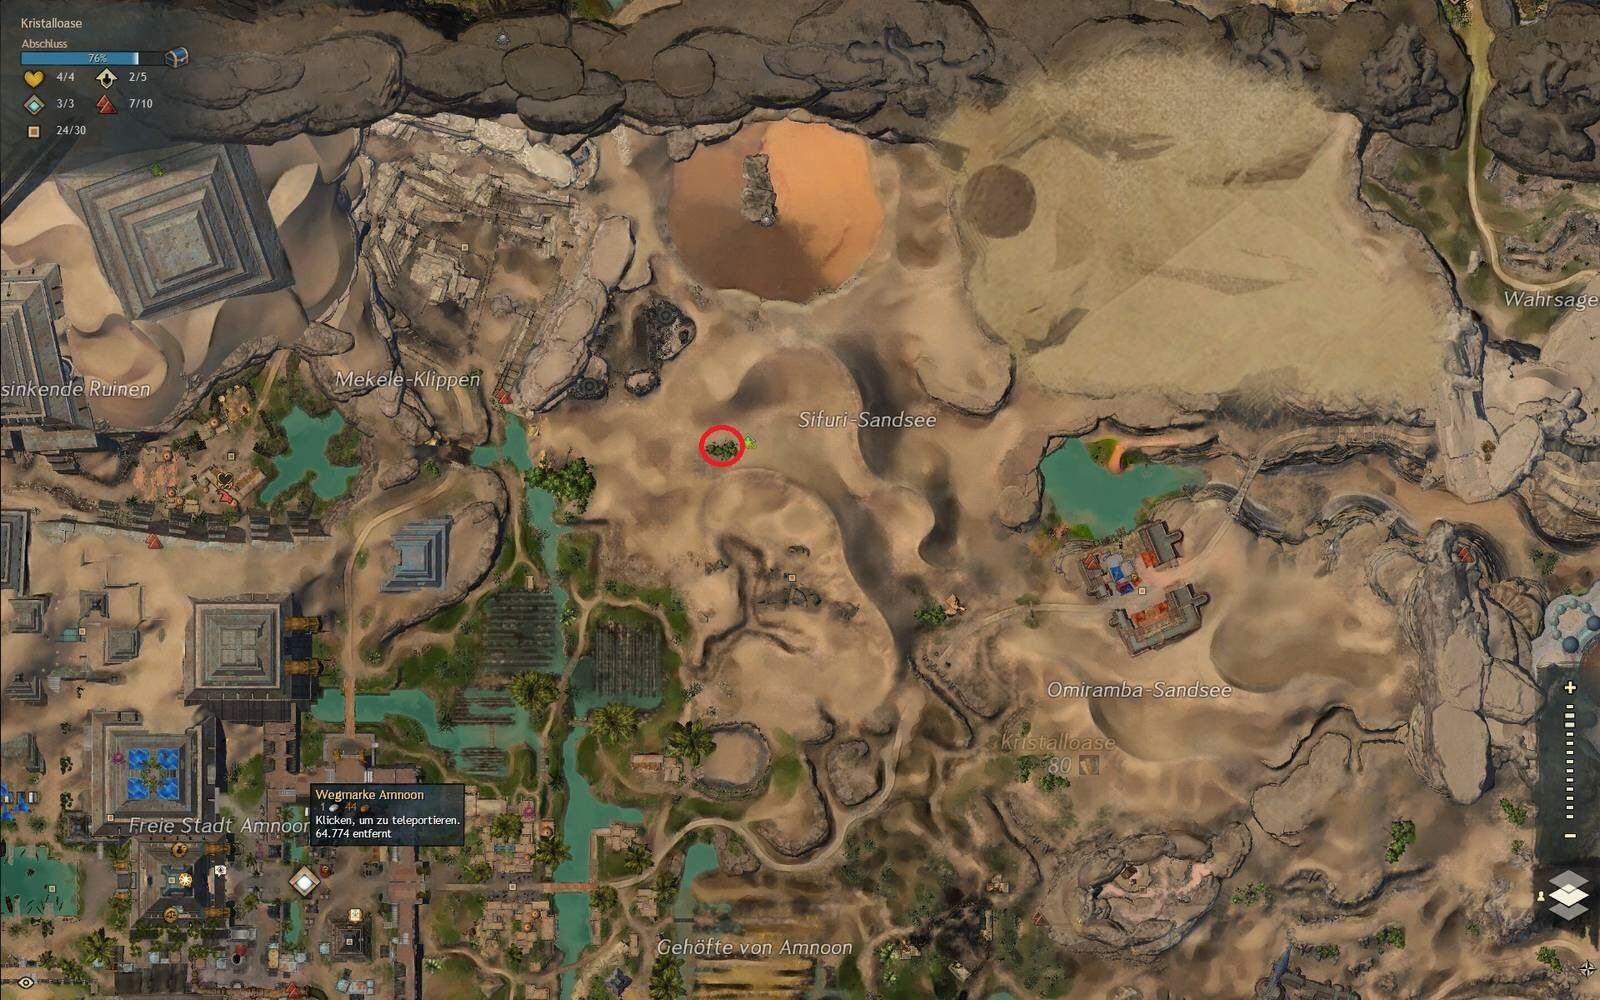 Guild Wars 2: Path of Fire Sandlöwe